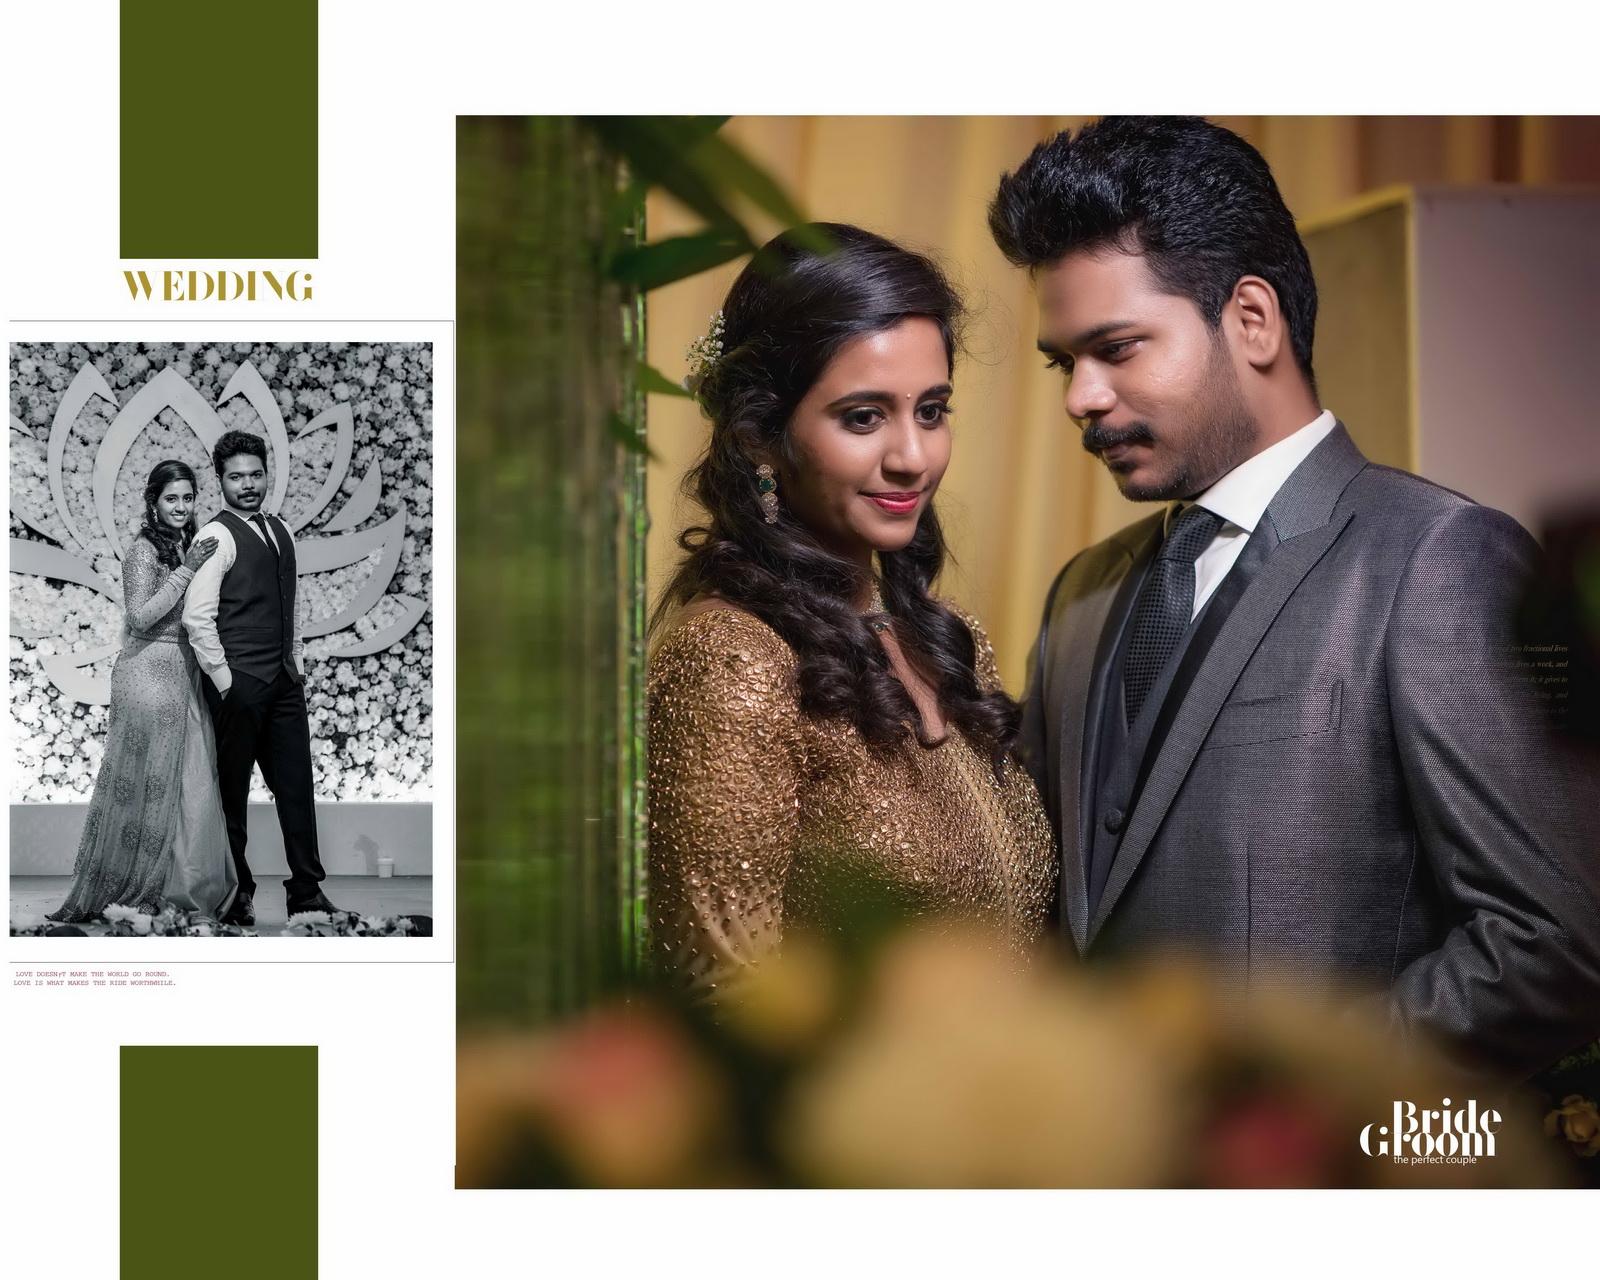 wedding photography in erode (9)